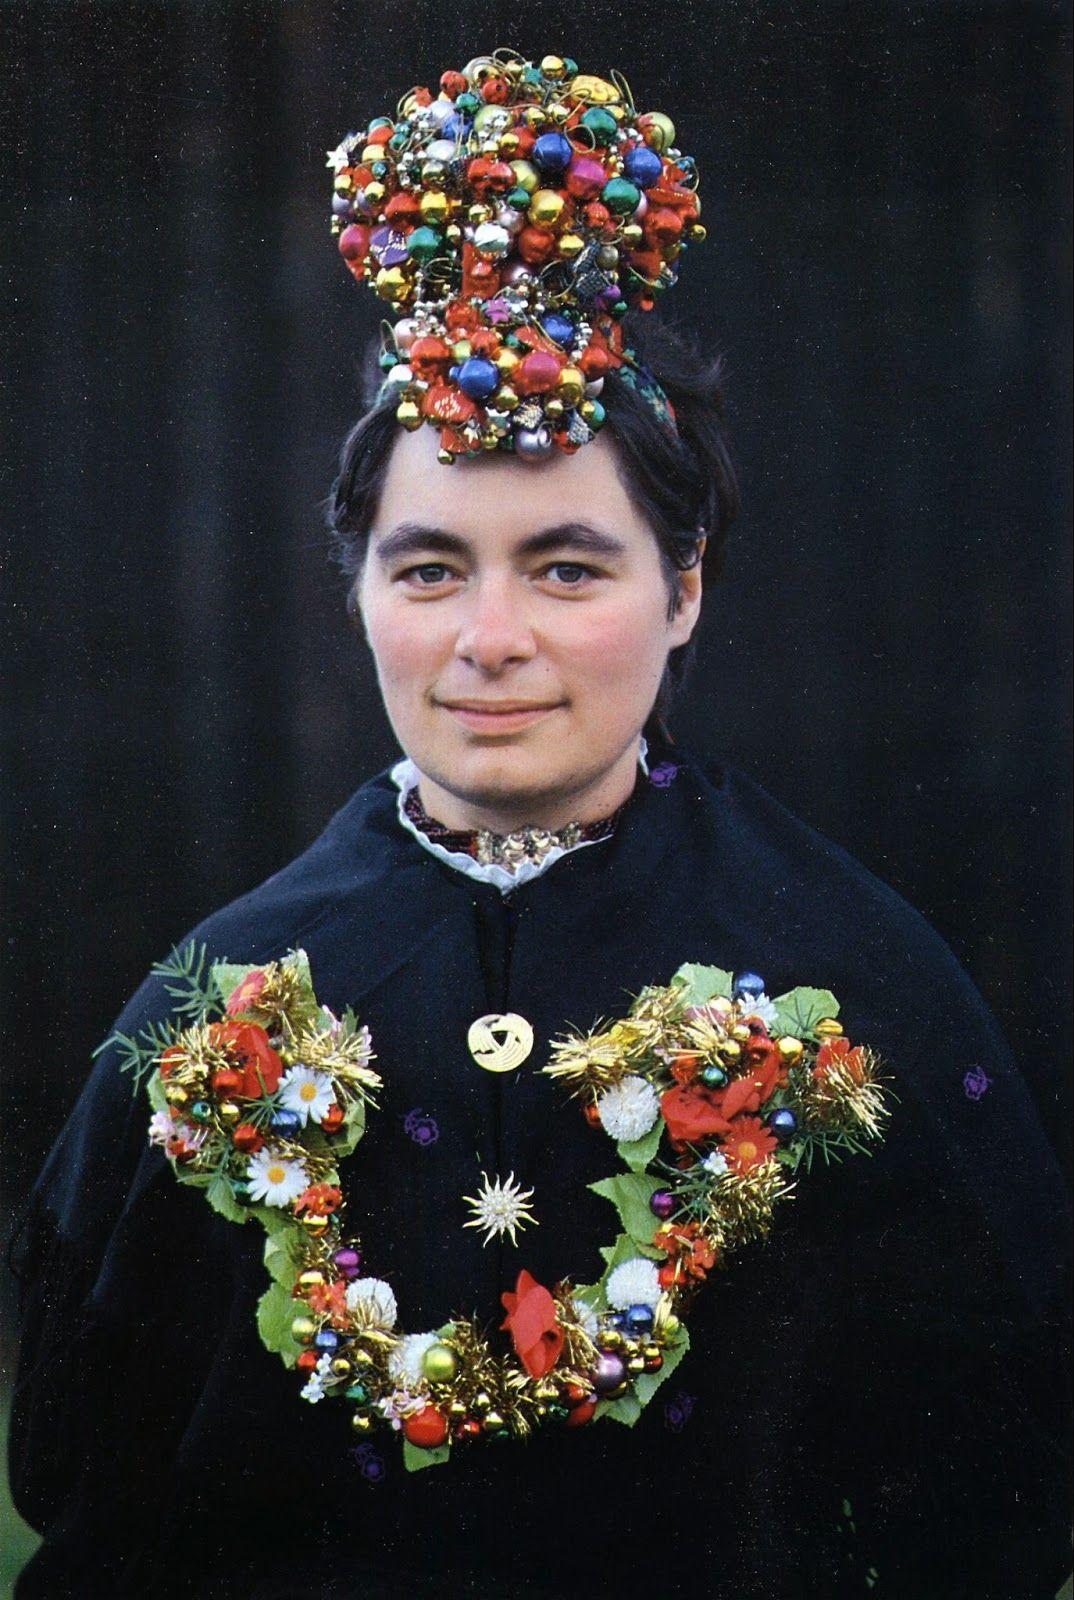 Folkcostumeembroidery Short Overview Of Traditional Bridal Dress In Western Europe: Wedding Dress German Folk At Reisefeber.org